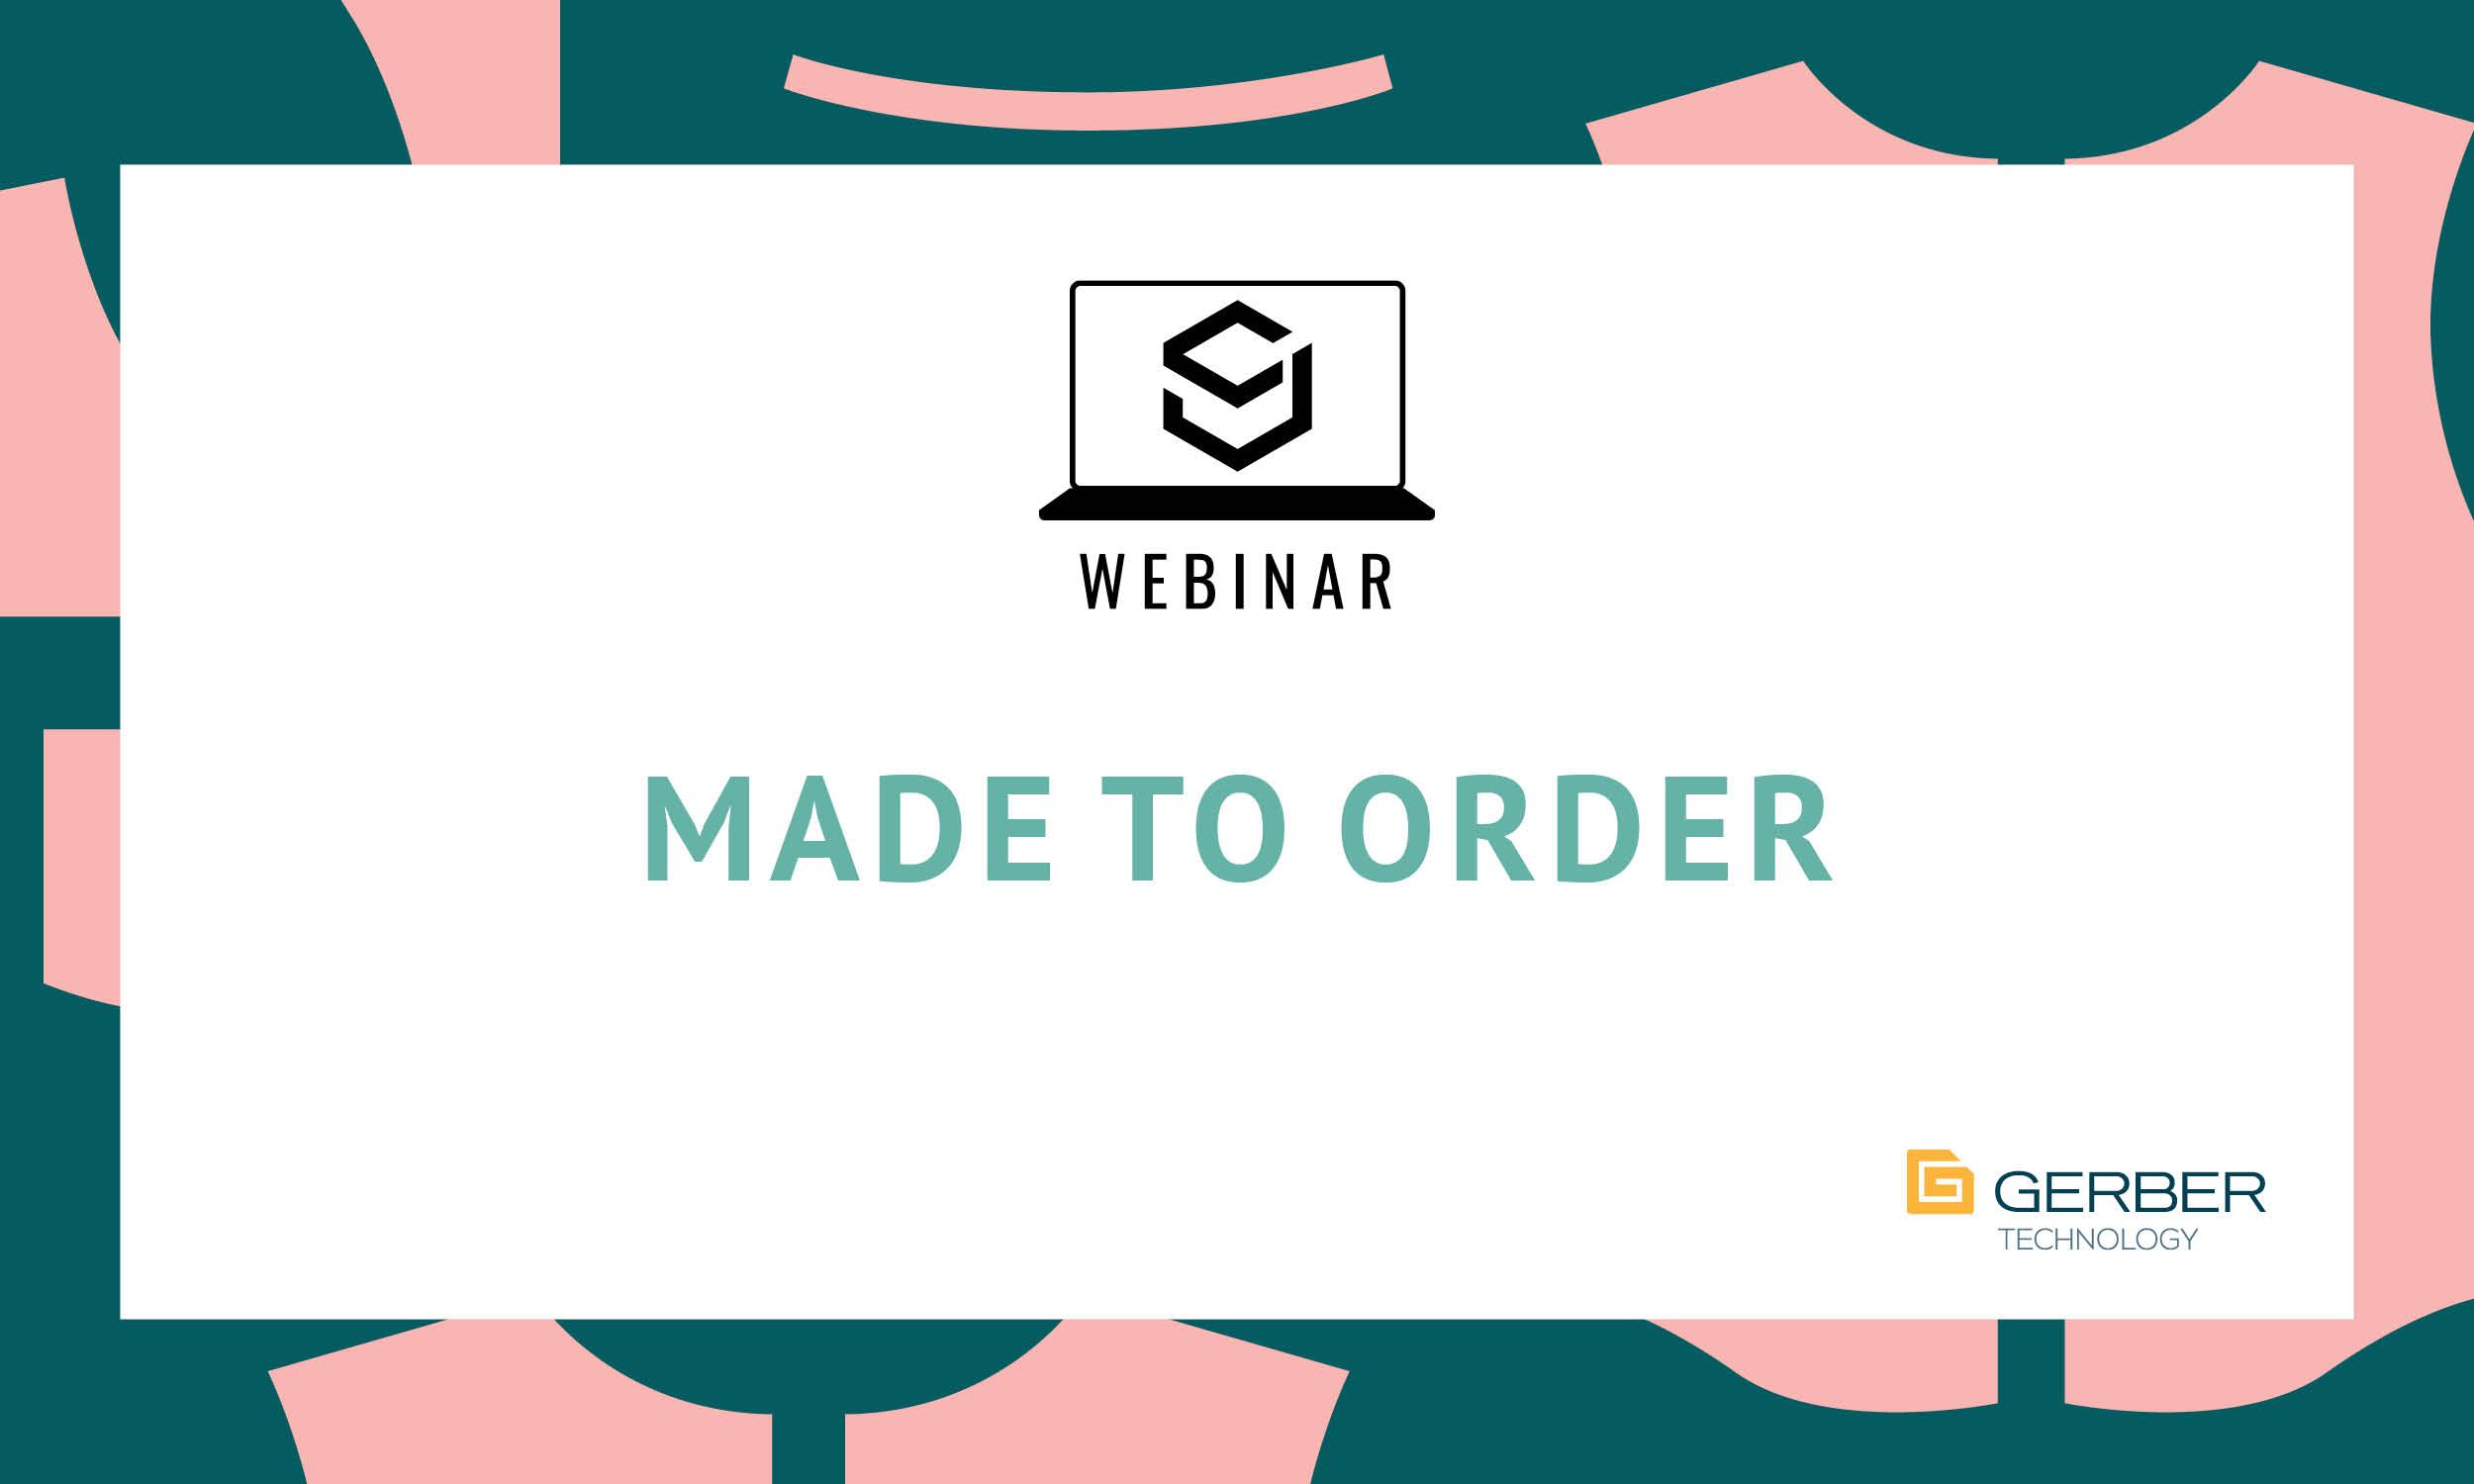 SJ Webinar: Made to Order